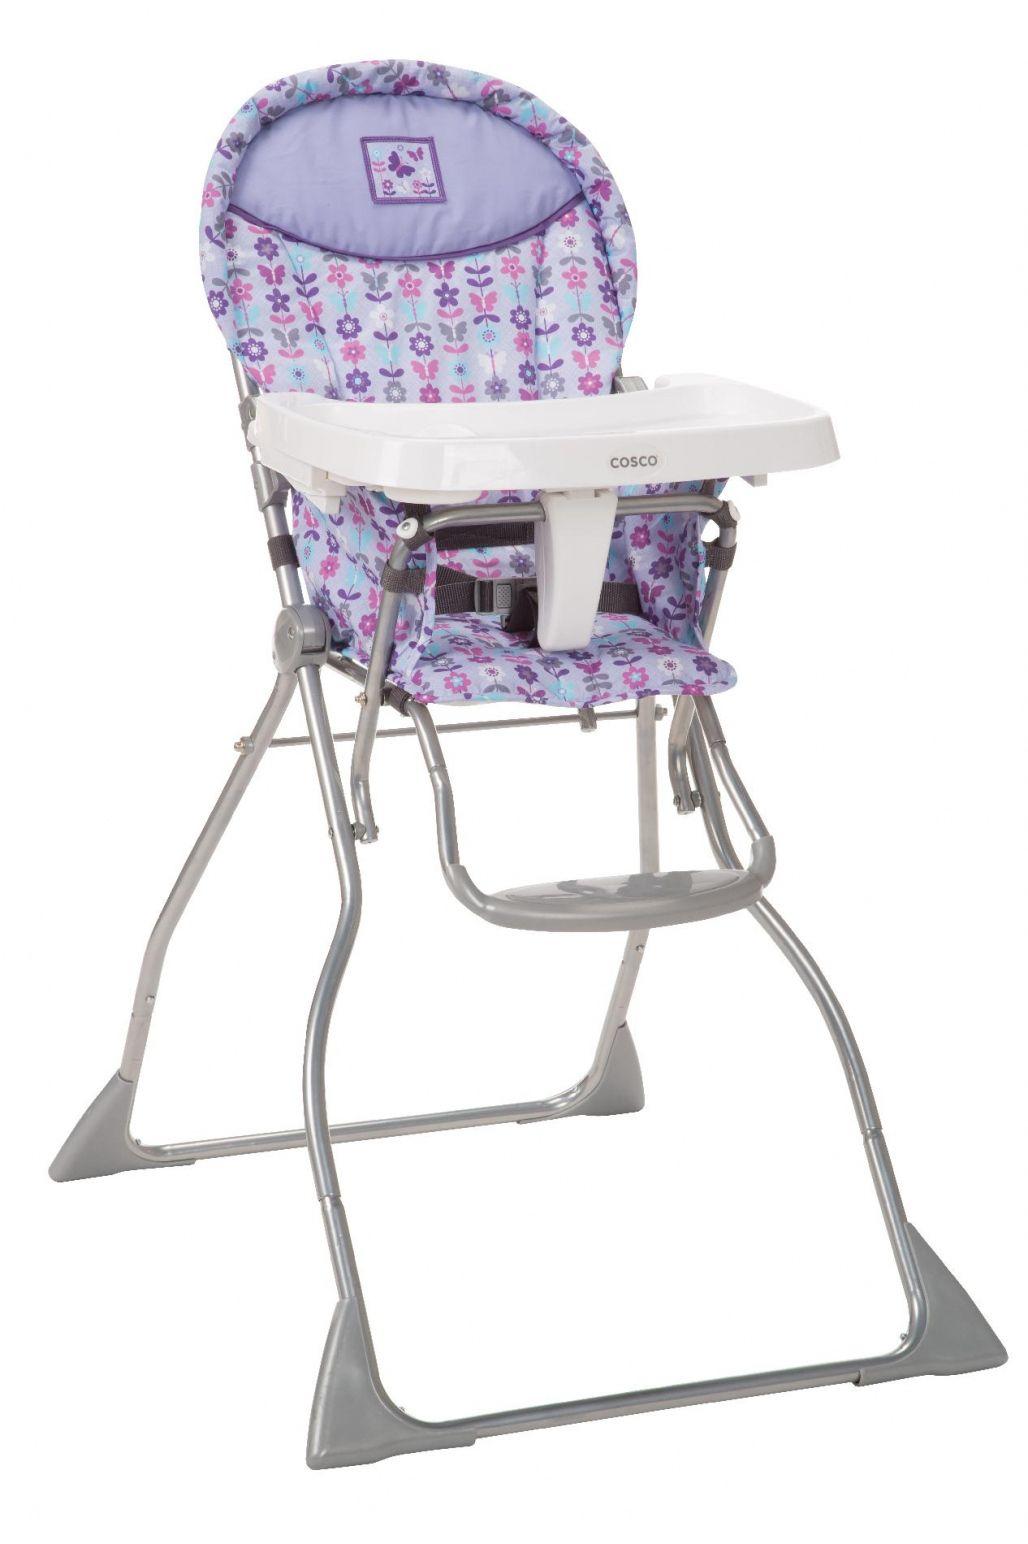 Kmart Baby High Chairs Chair Design Photo Pin Oleh Jooana Di Evolusion Concept Table Dan New 100 Diy Kitchen Countertop Ideas Check More At Http